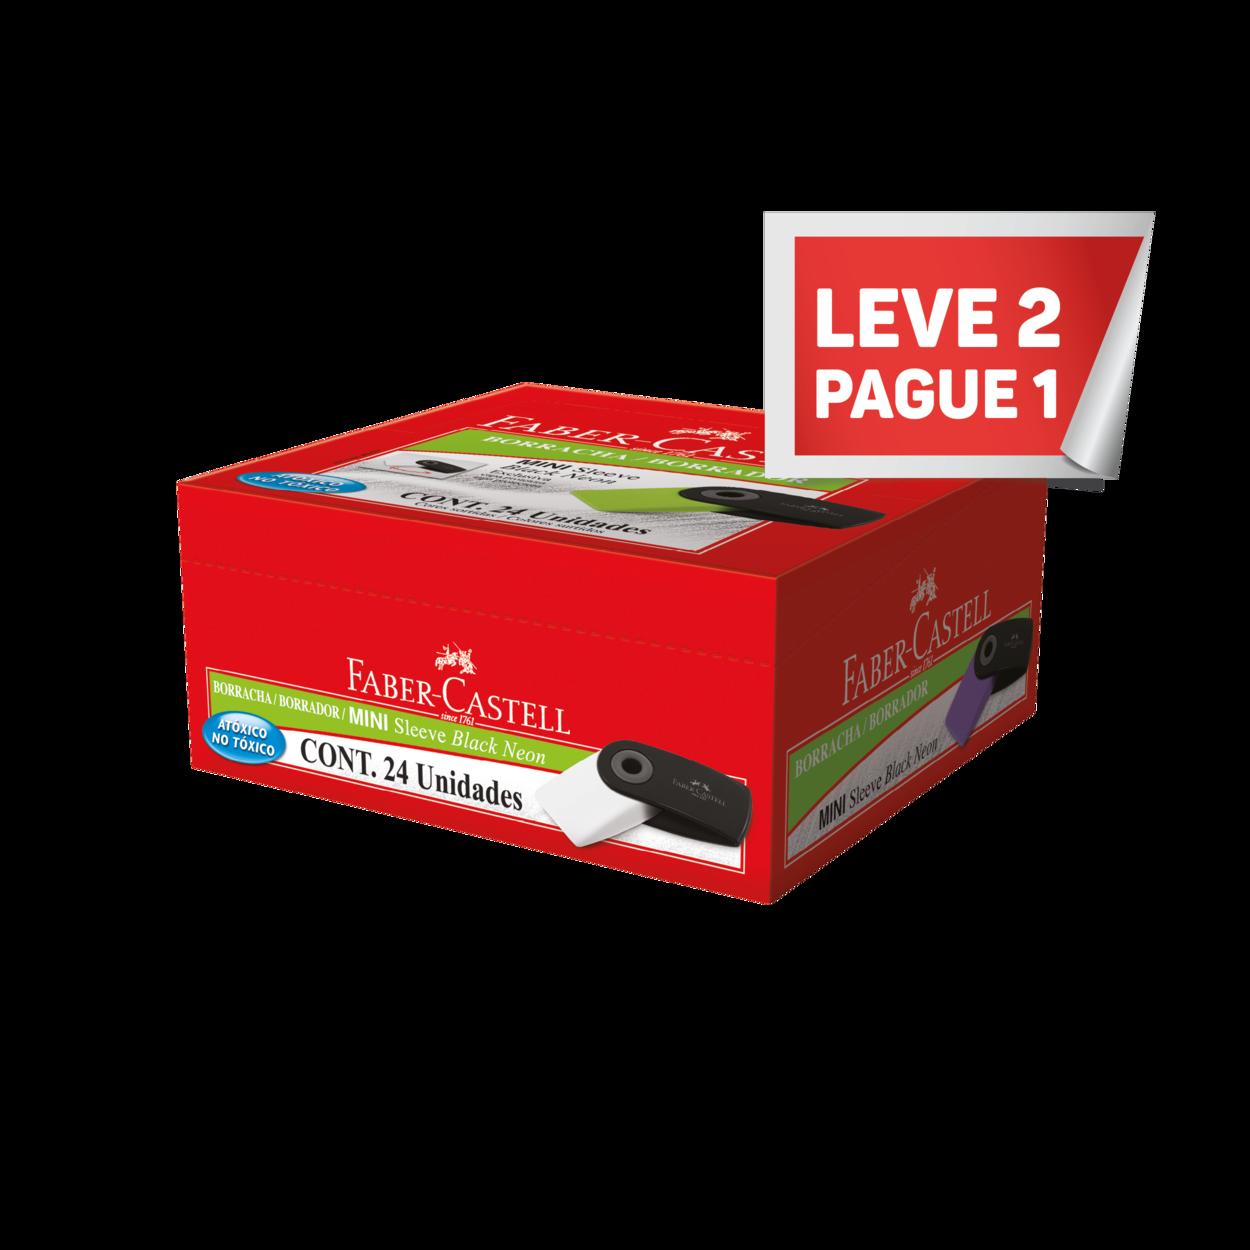 Leve 2 Pague 1 Borracha Faber-Castell Mini Sleeve Black Neon Mix (24 Unid/cada) - MSLEEBOBN